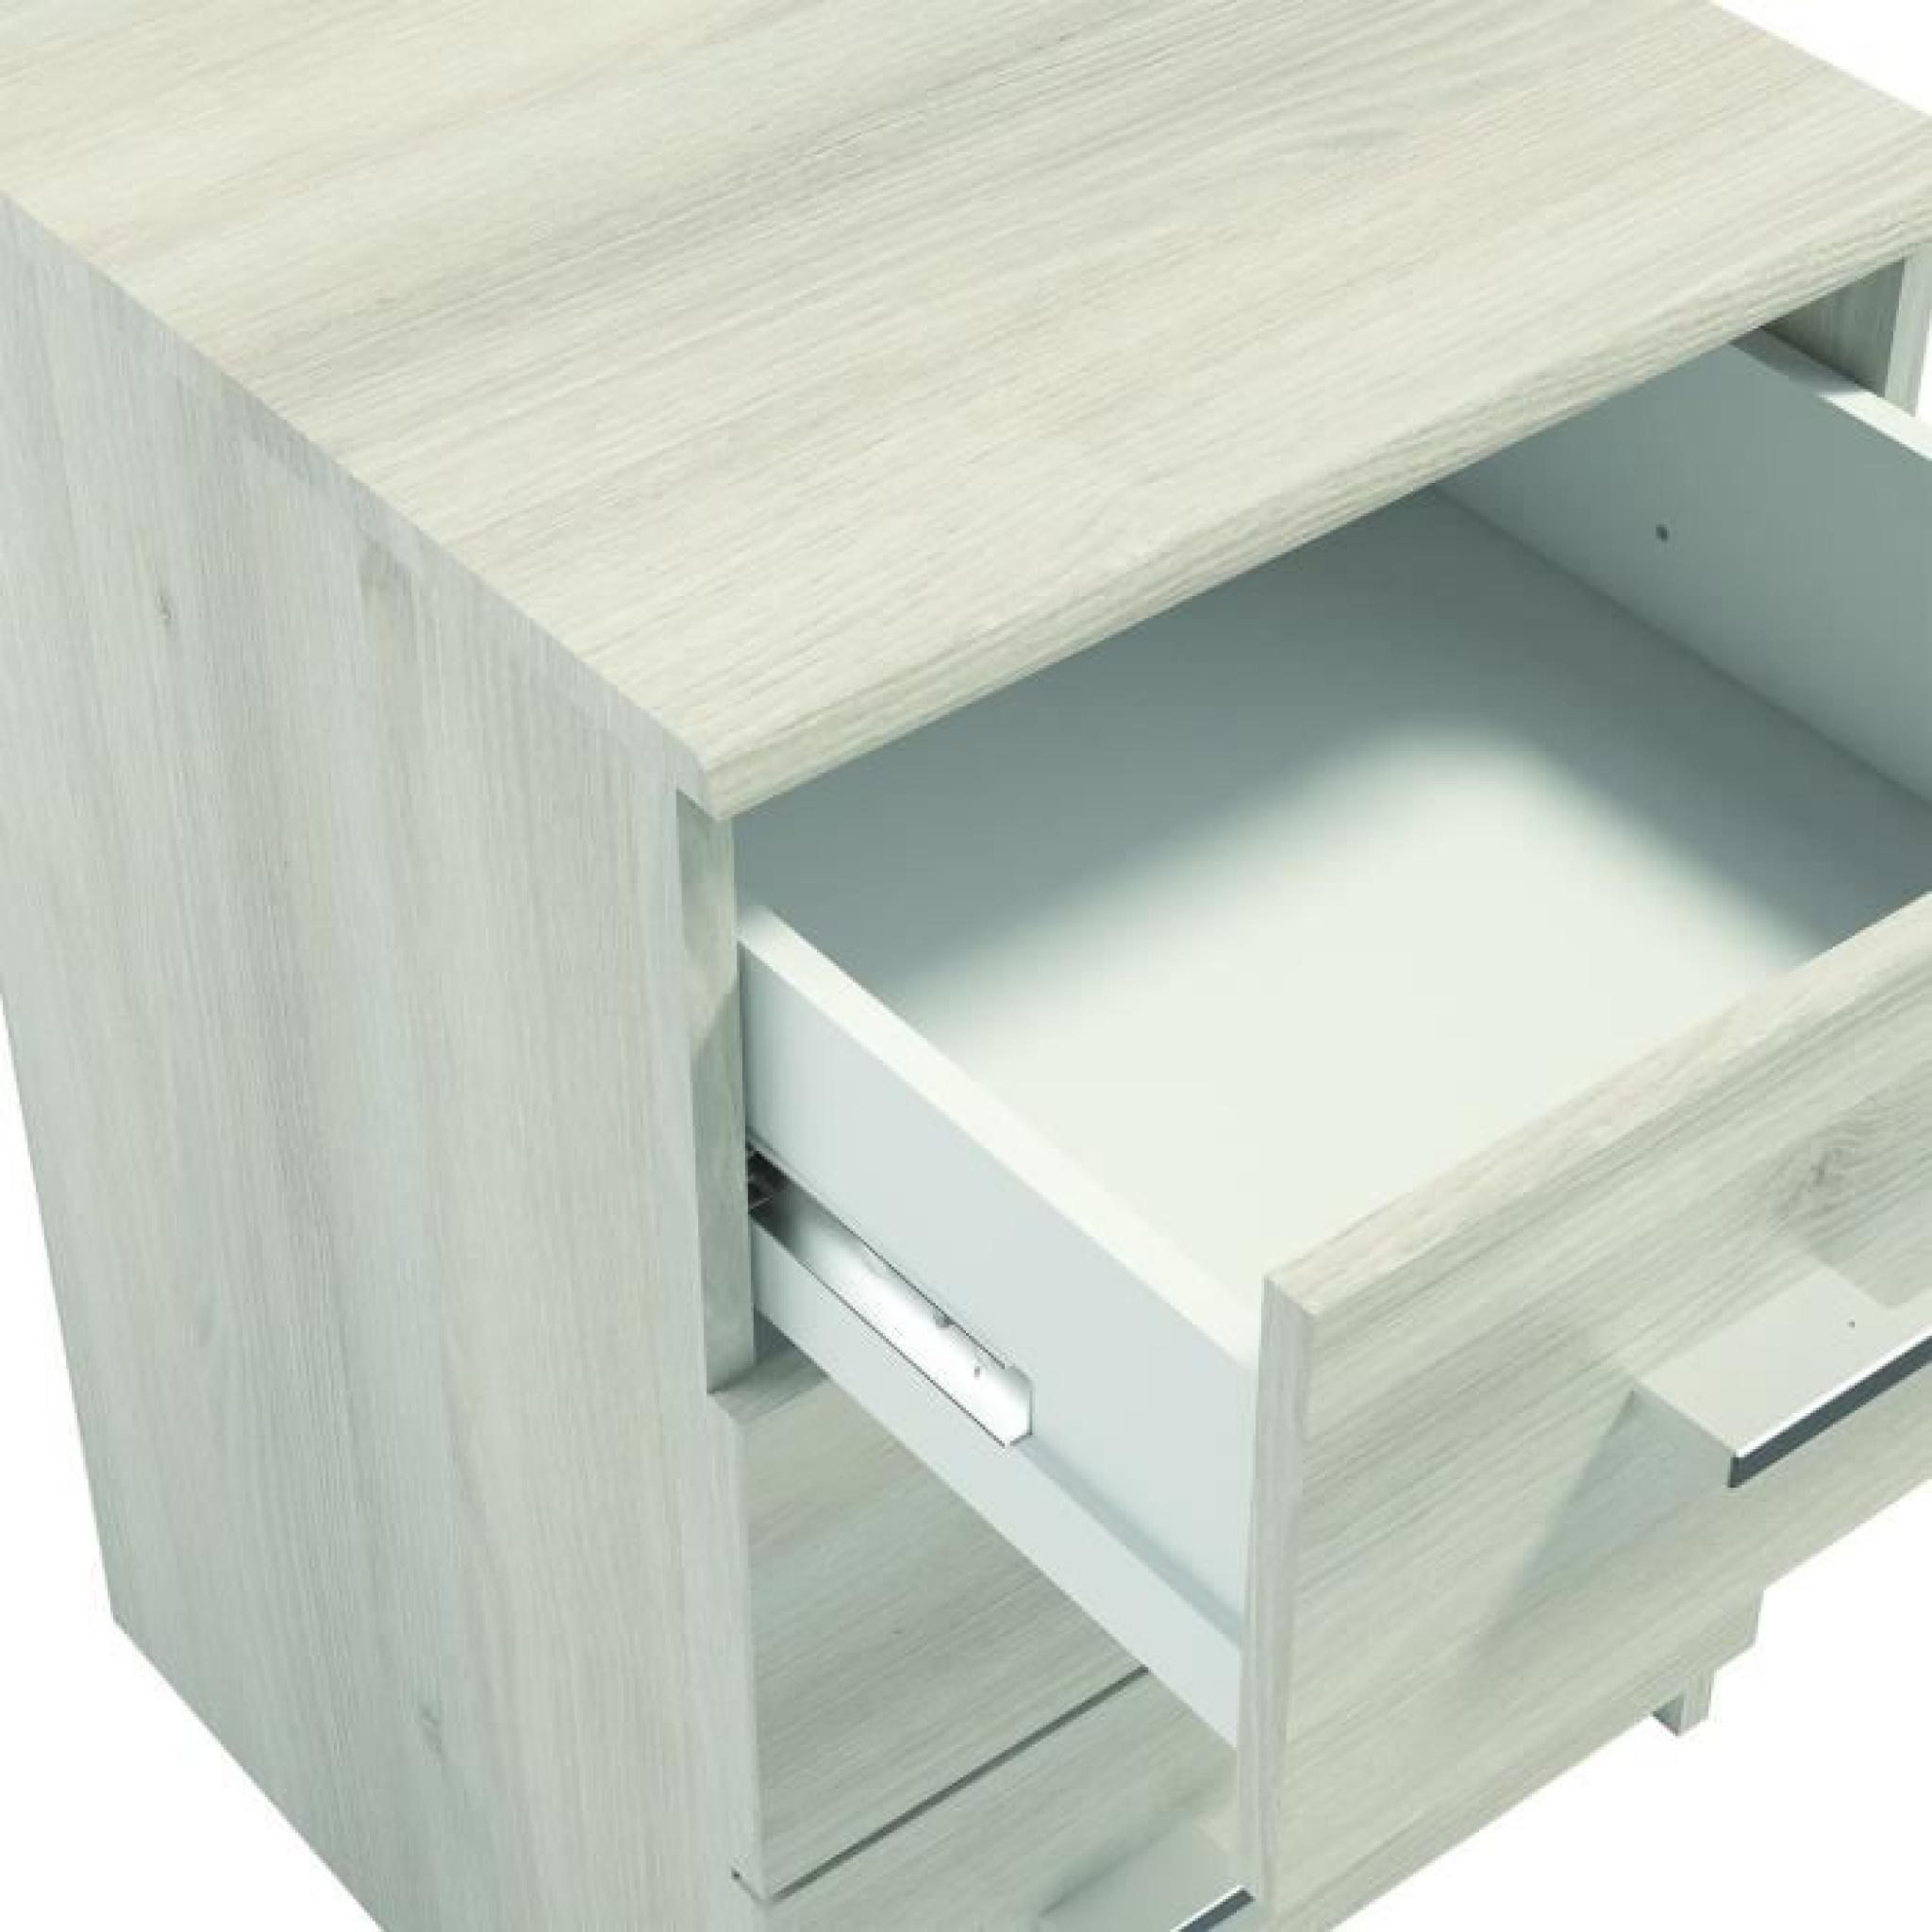 table de chevet new york pas cher. Black Bedroom Furniture Sets. Home Design Ideas